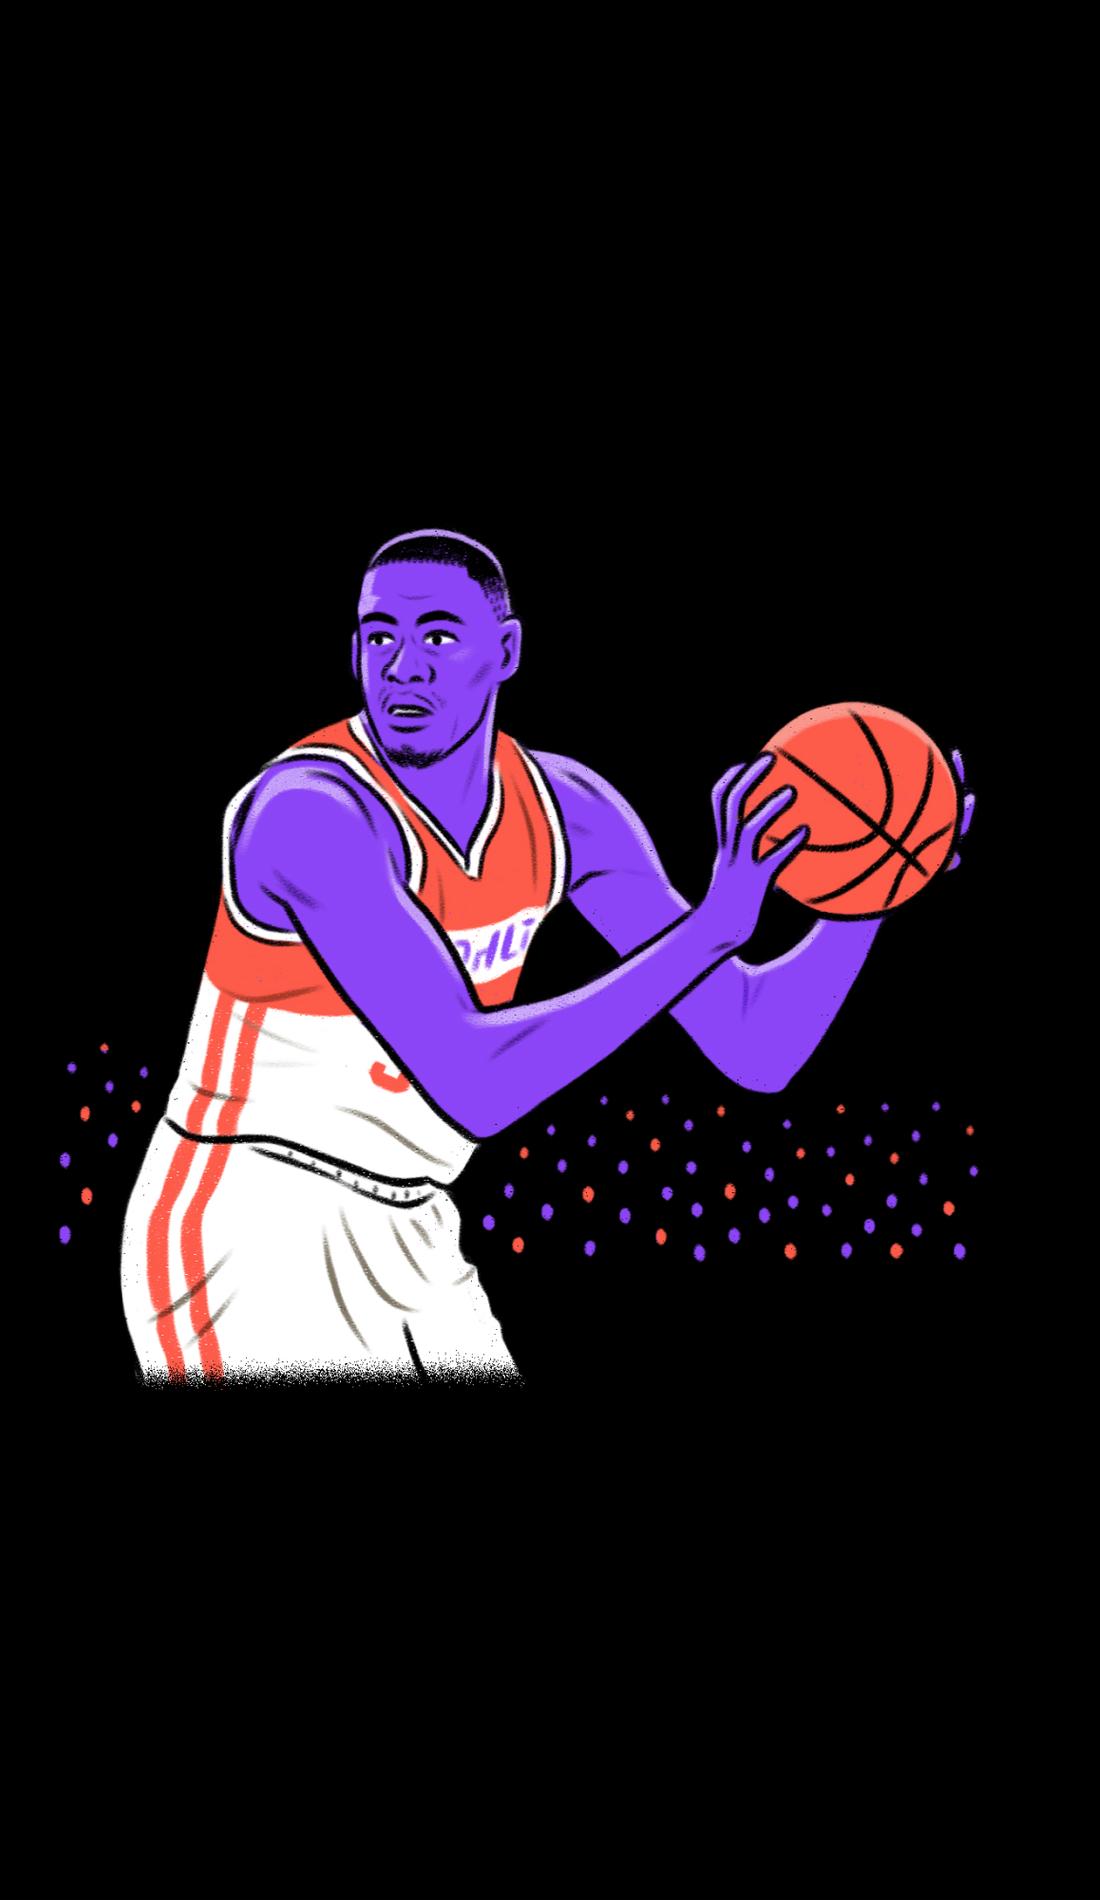 A UNC Greensboro Spartans Basketball live event